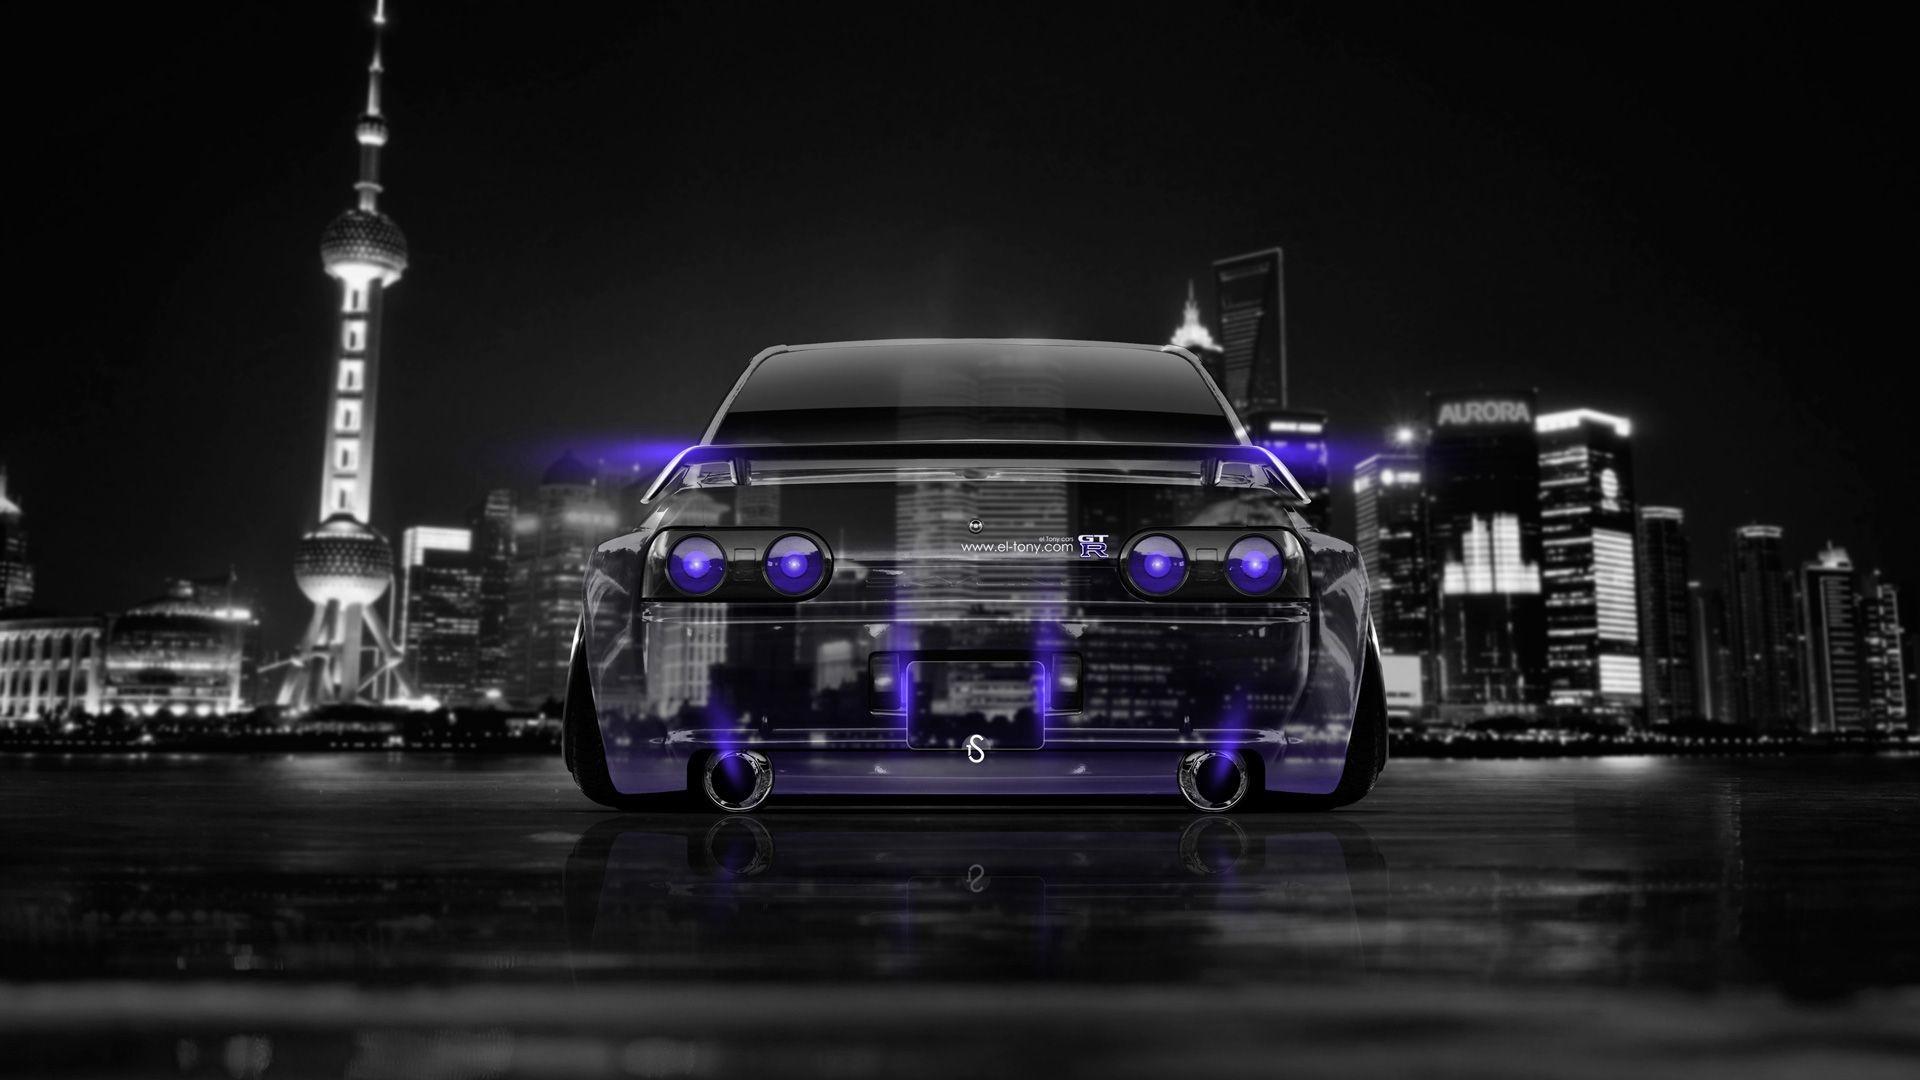 Attirant 1920x1080 Nissan Skyline GTR R32 JDM Back Crystal City Car 2014 Â« El Tony